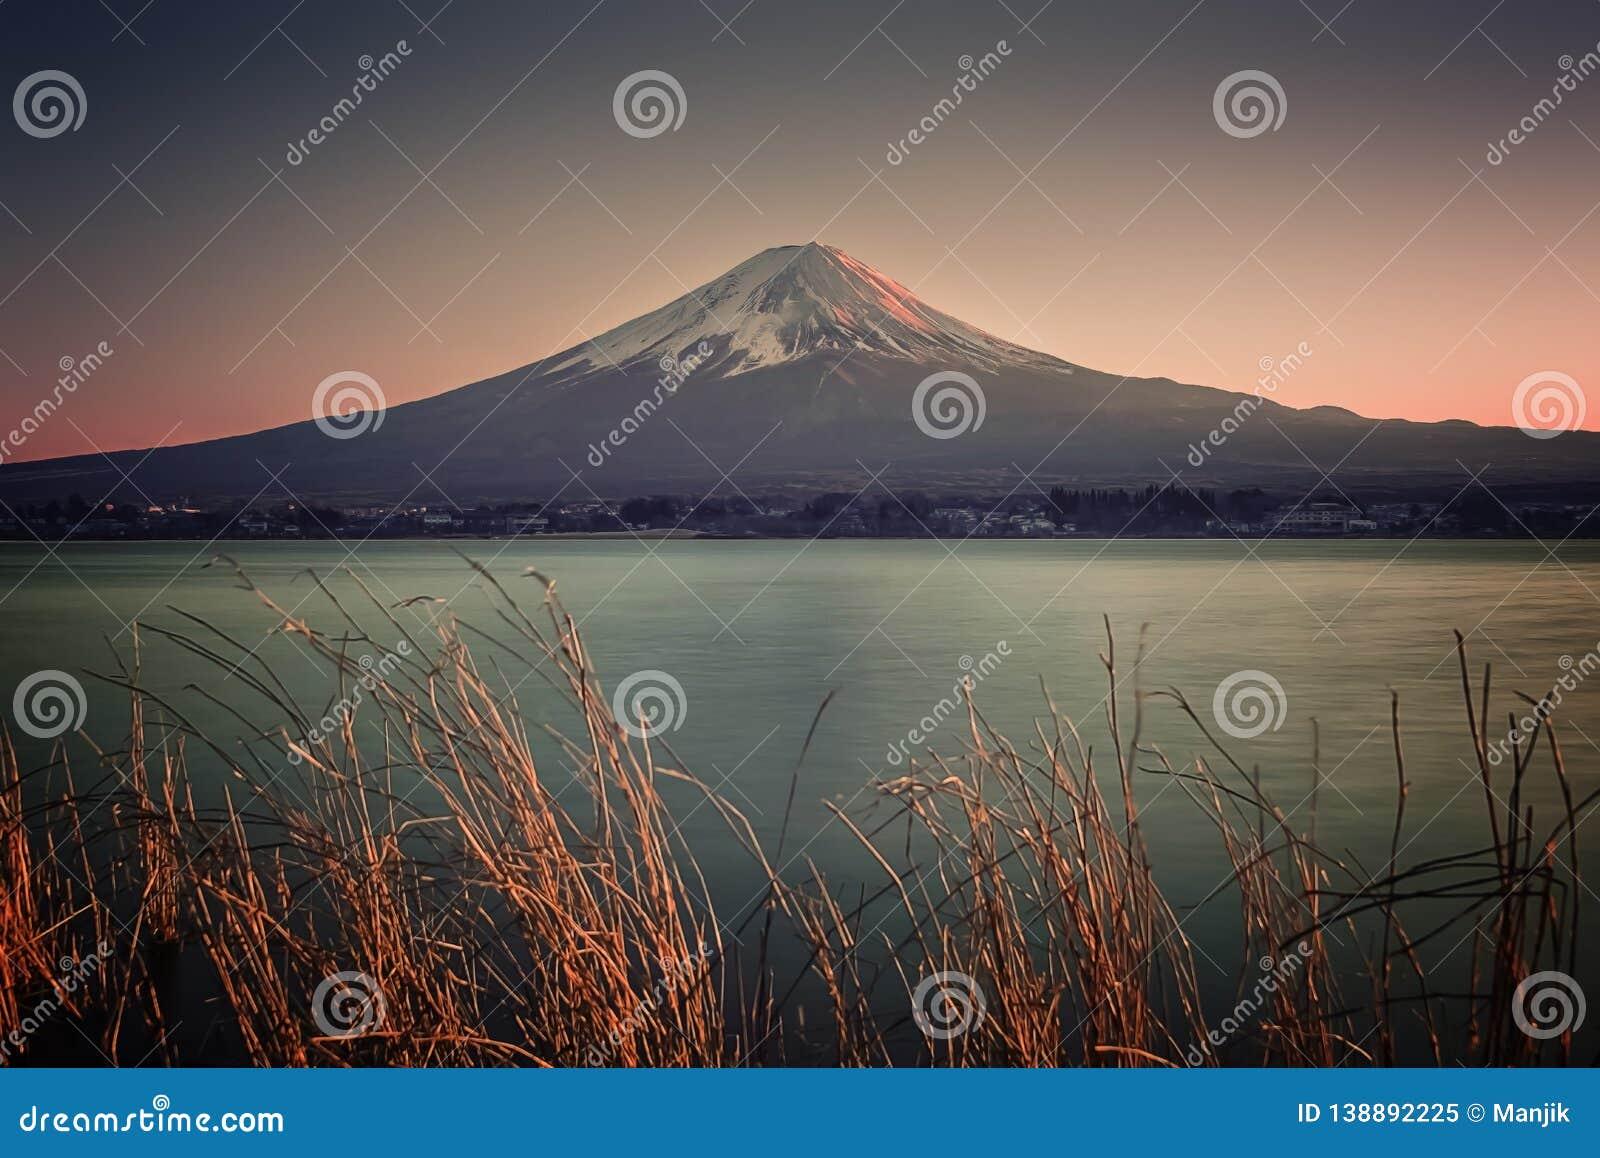 Japanese landscape at sunset